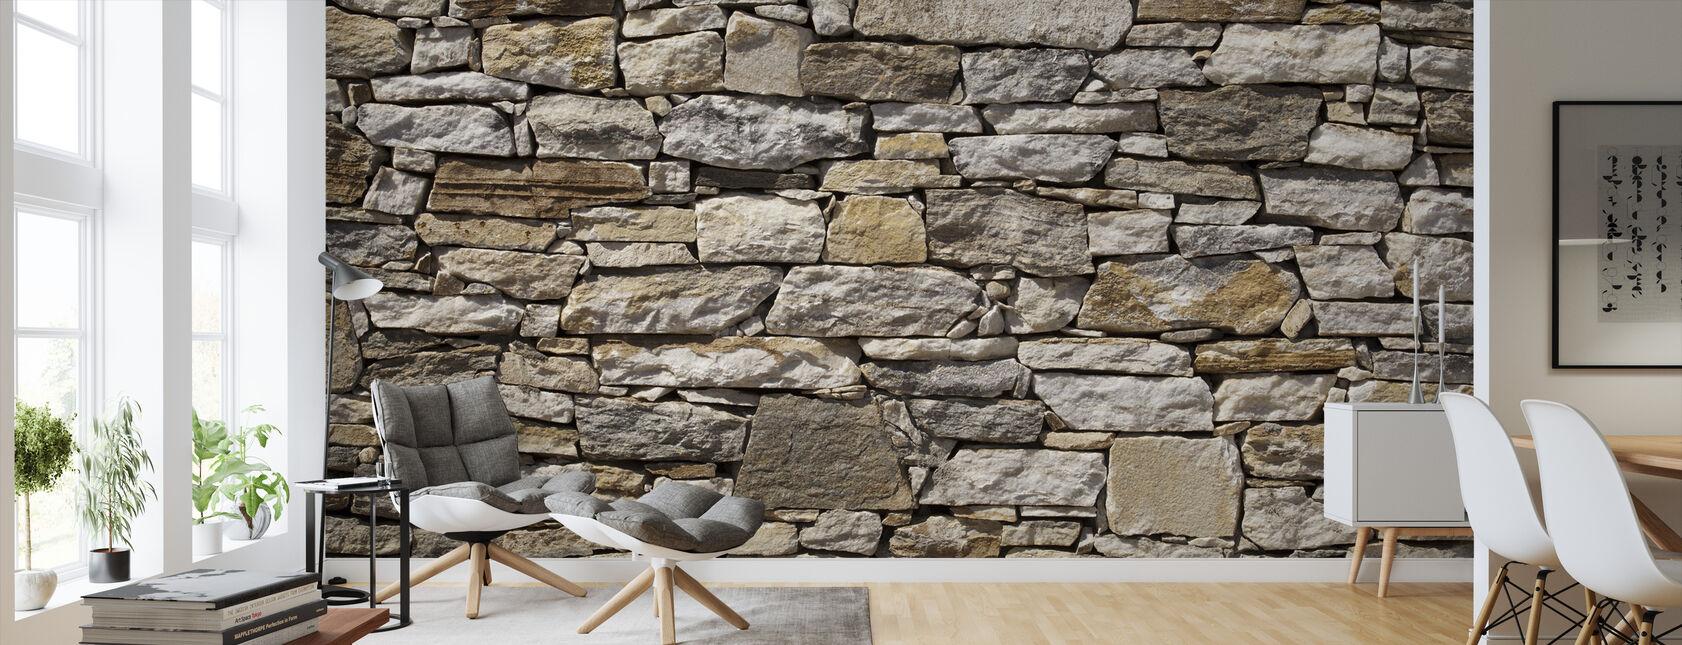 Stenmur bakgrund - Tapet - Vardagsrum